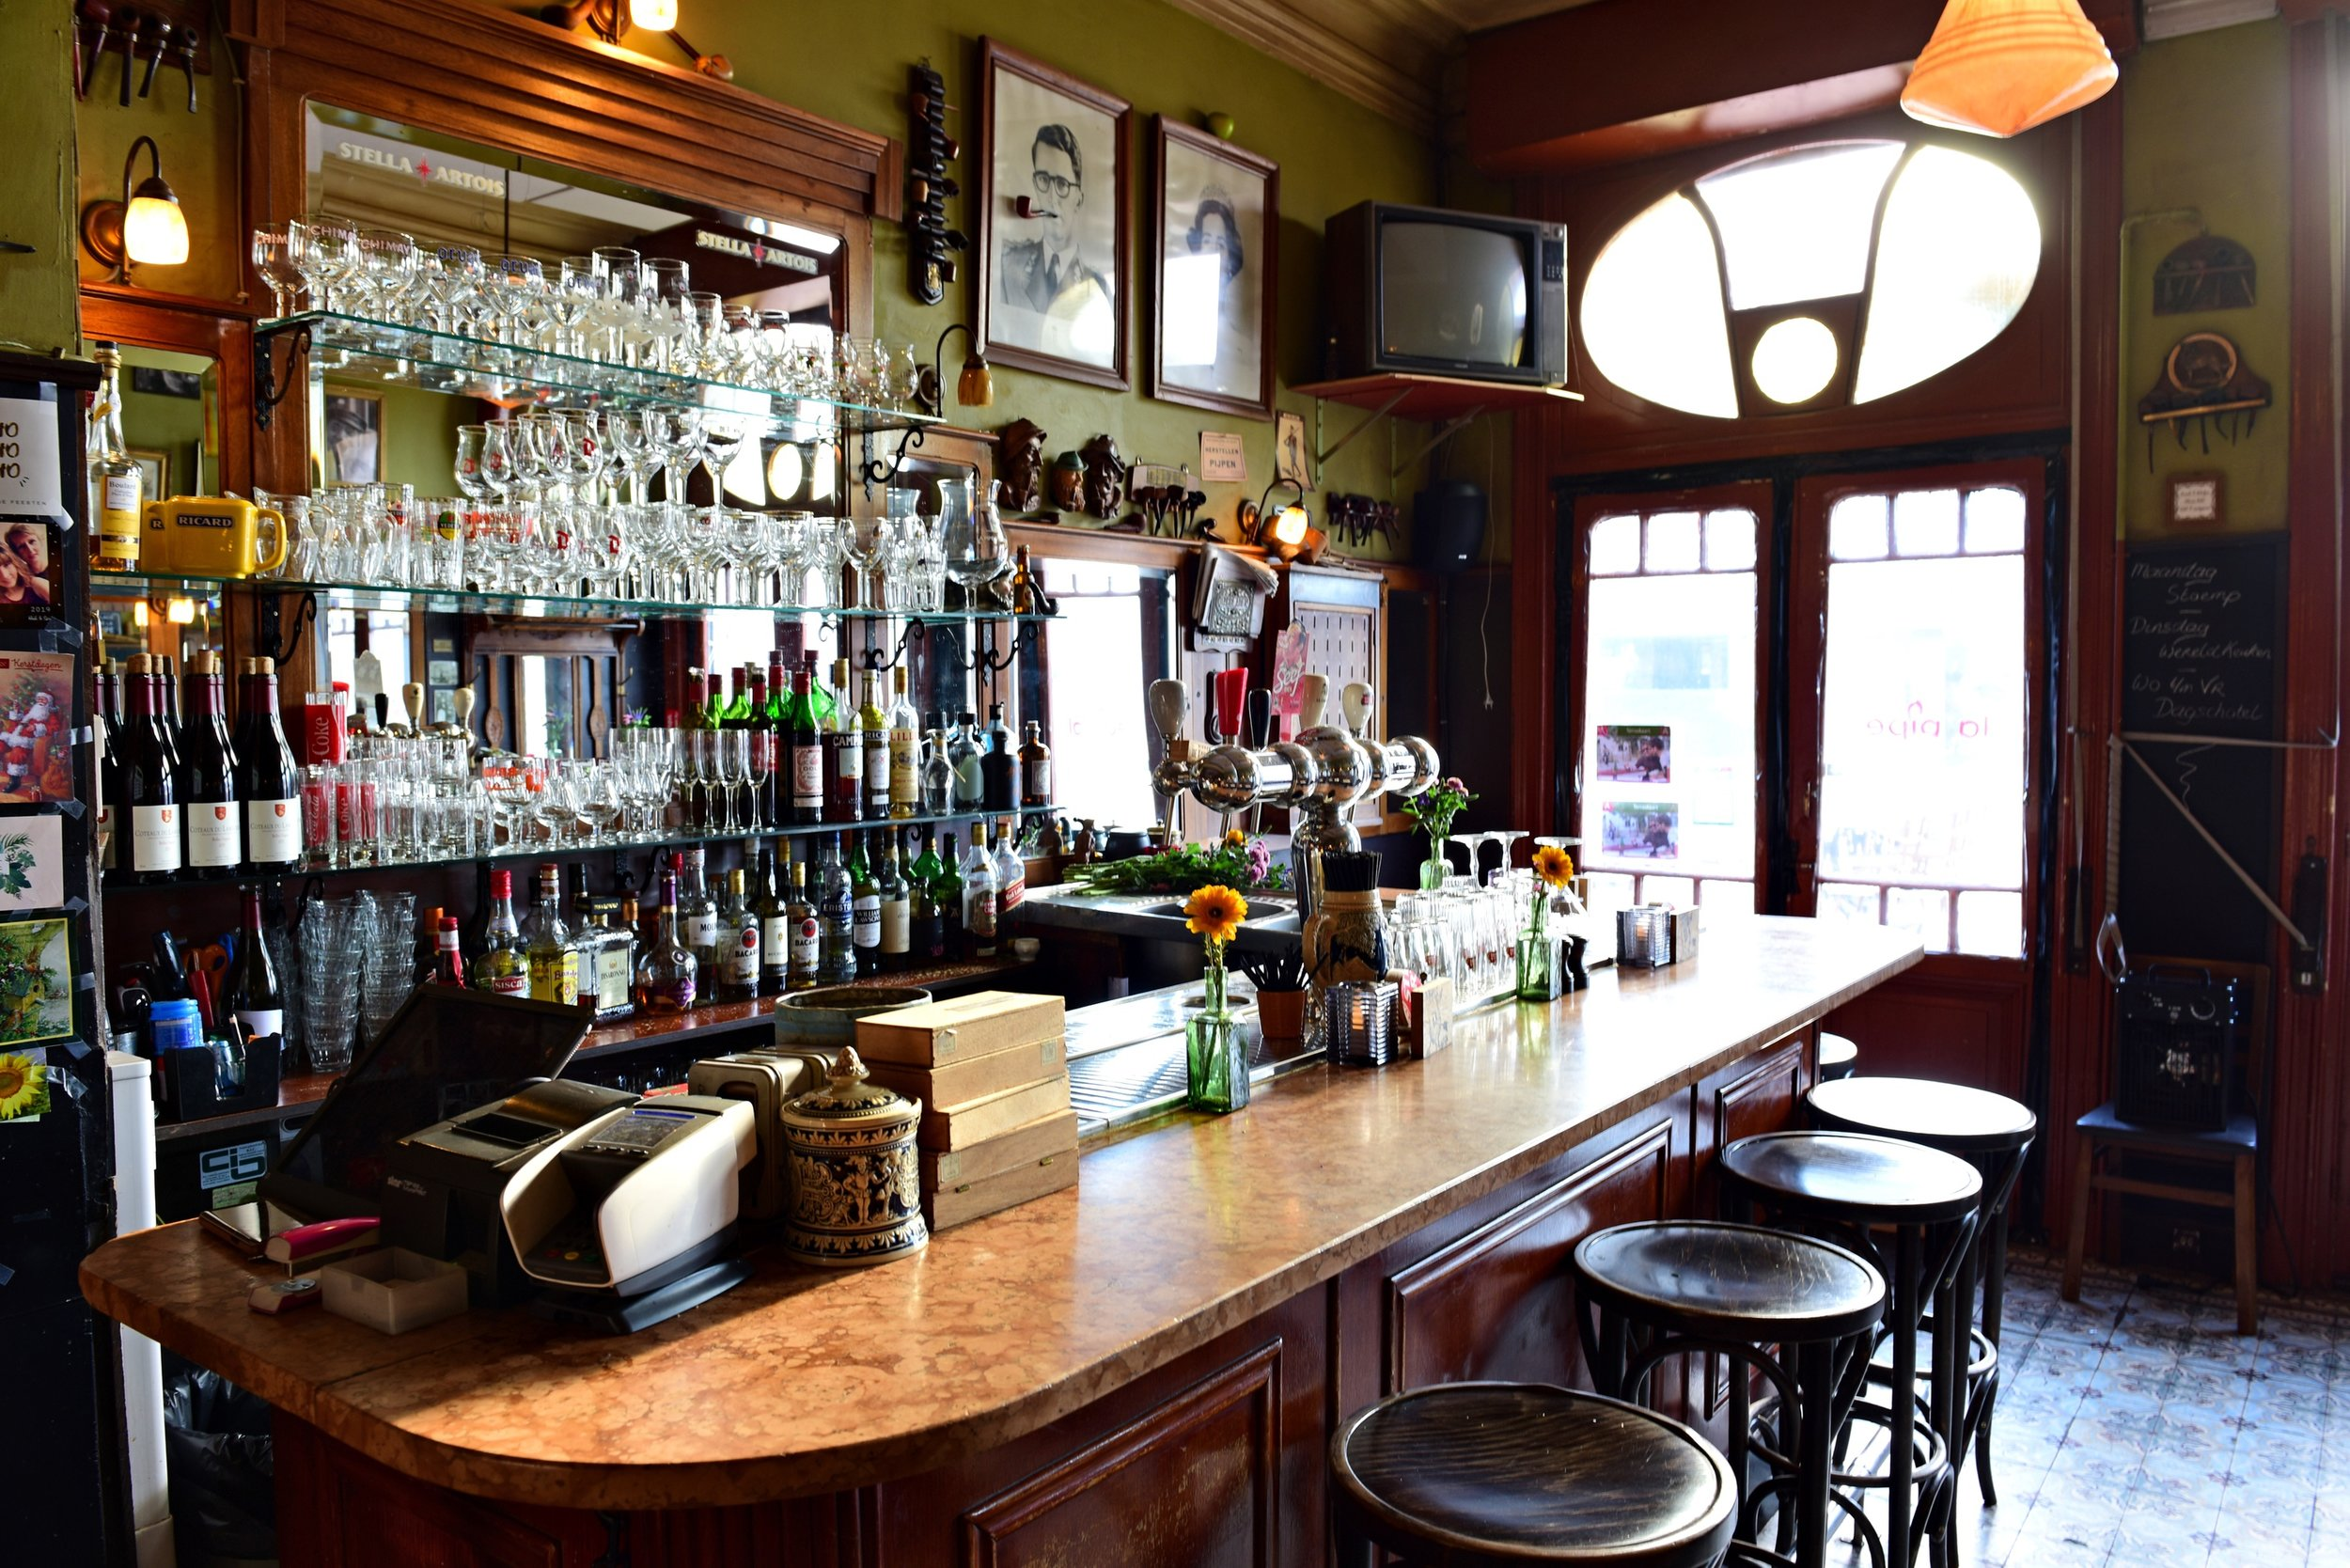 6 la pipe d anvers antwerpen brasserie antwerp best restaurant tablefever.jpg